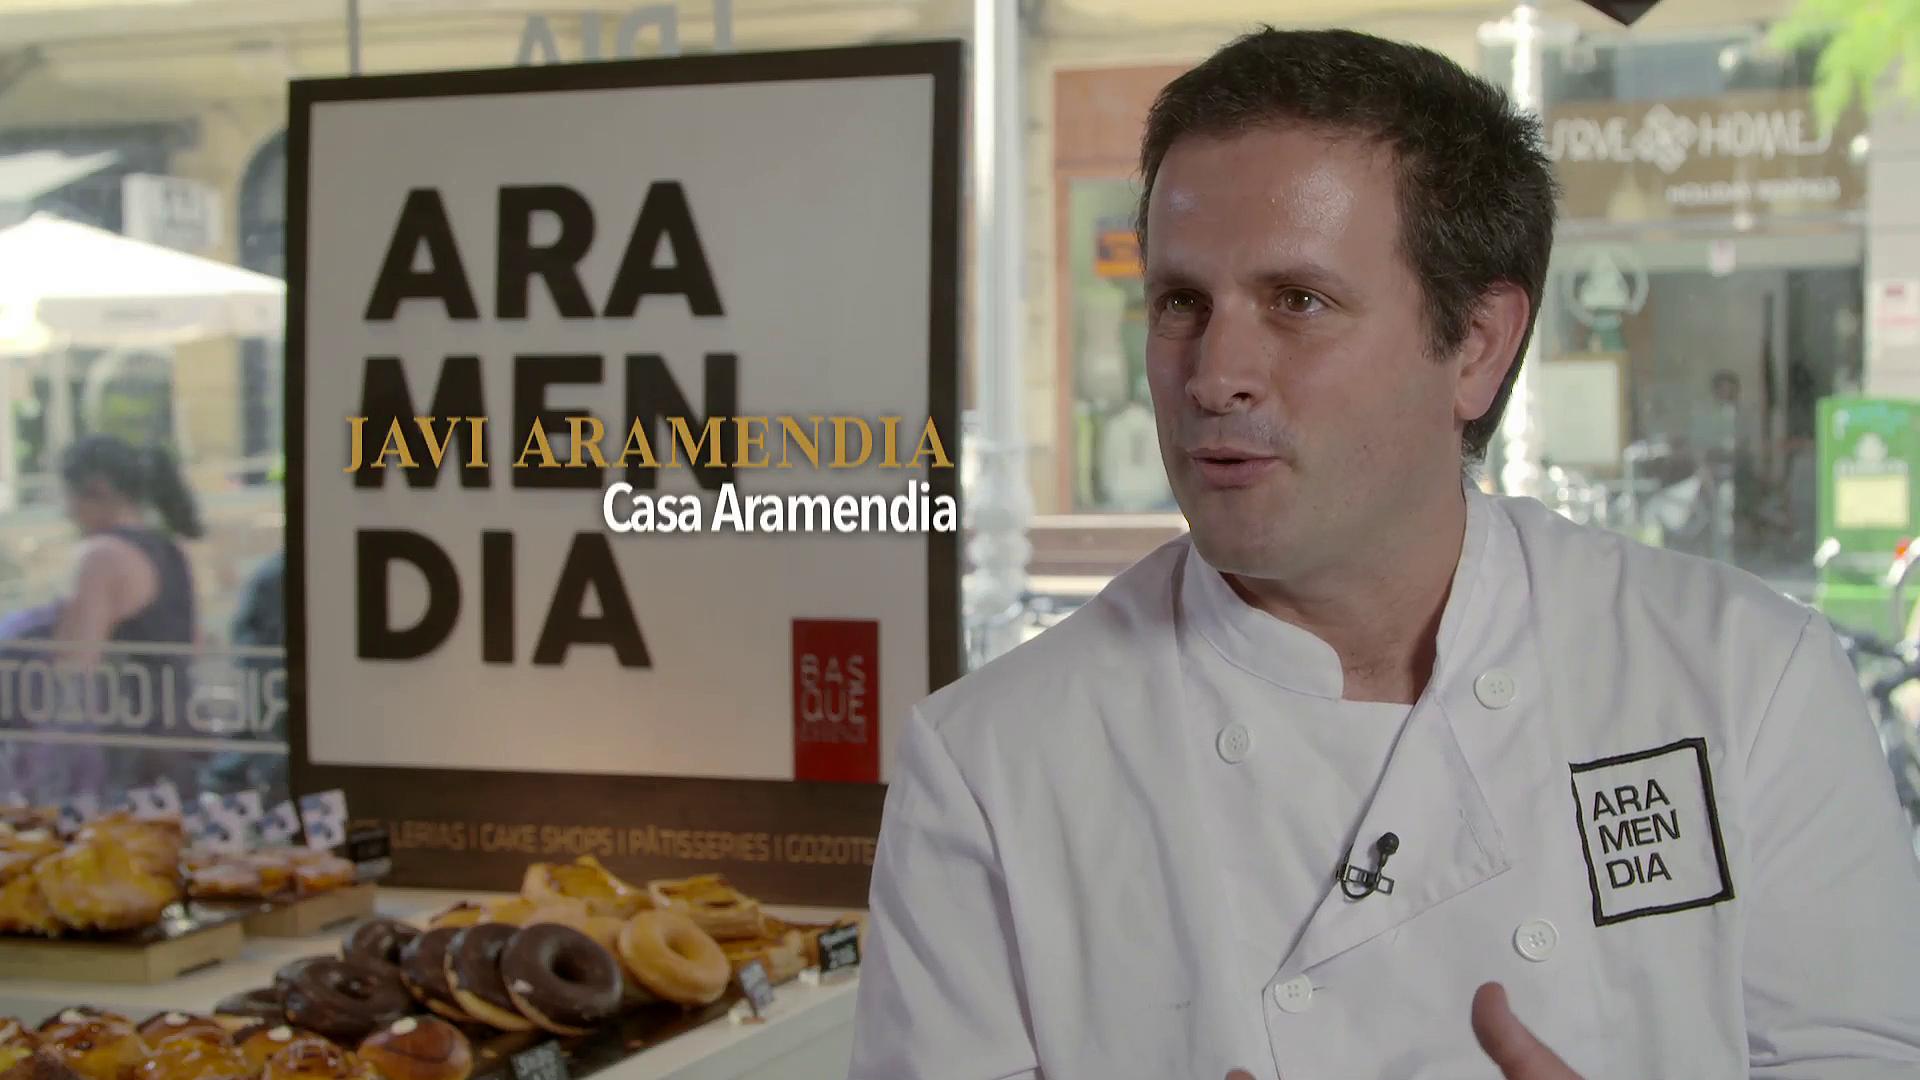 Premios Comercio y Turismo 2016. Casa Aramendia - Javier Aramendia